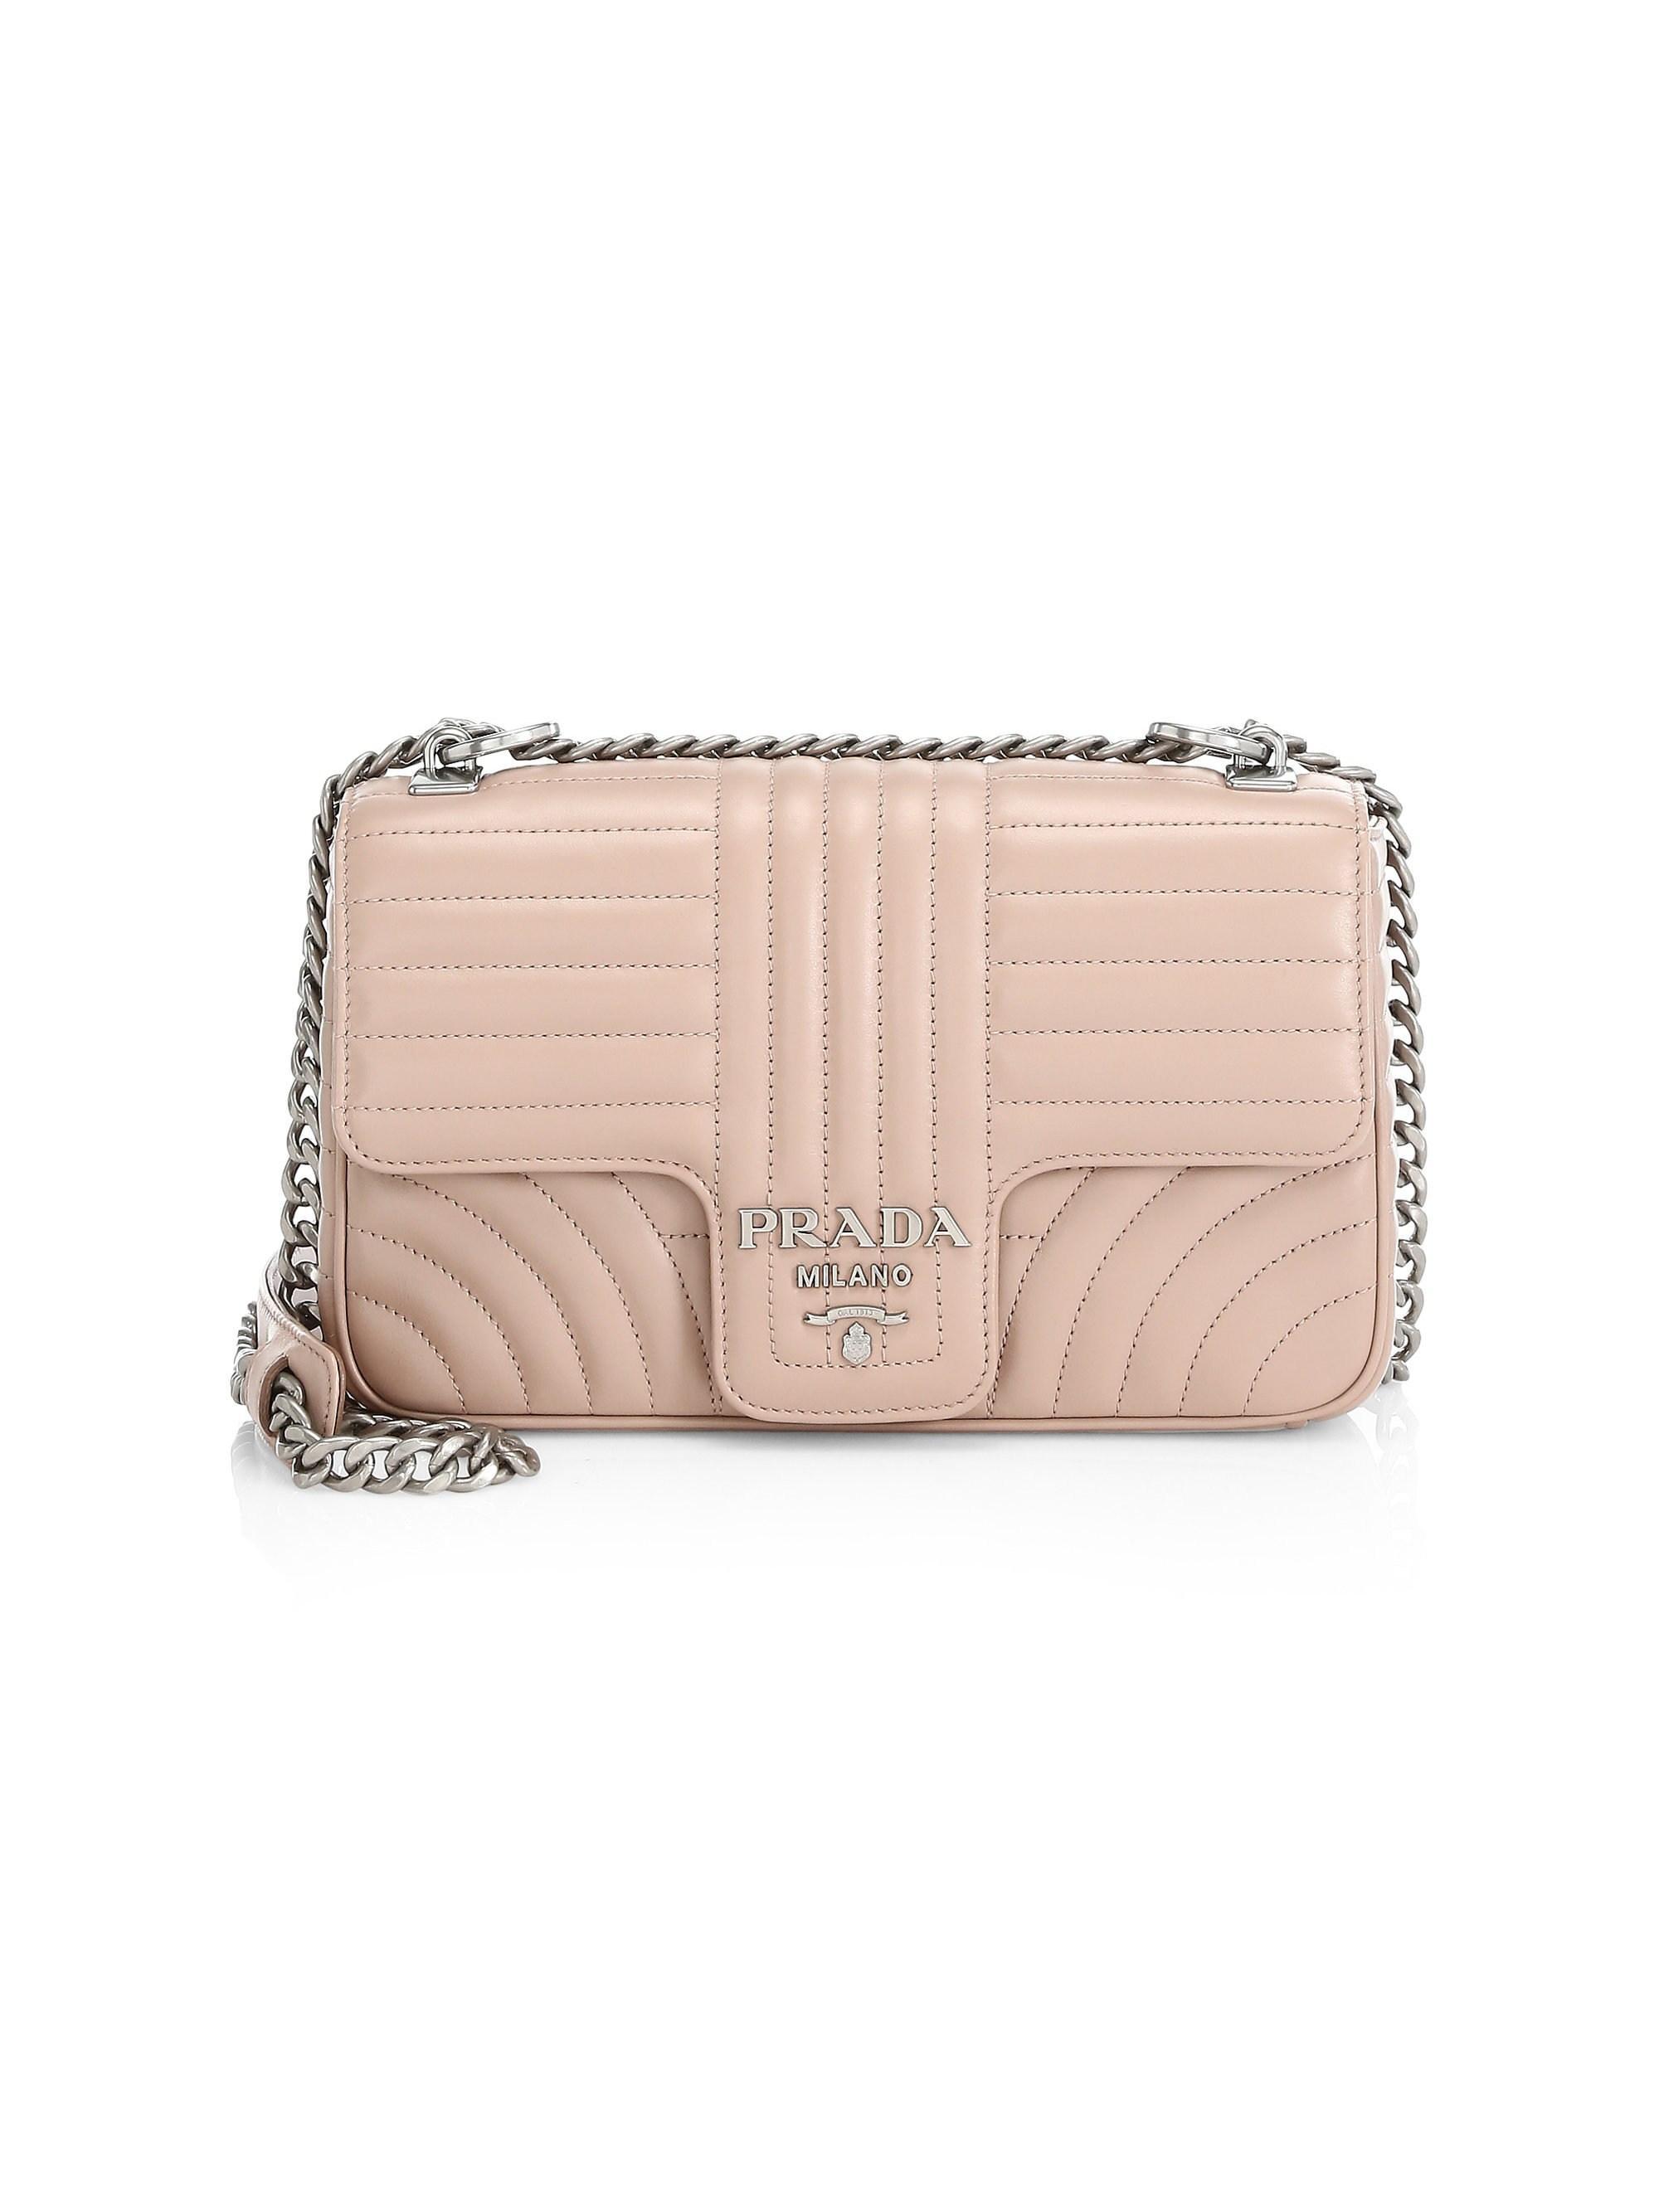 feadcaba8d8 Lyst - Prada Women s Medium Diagramme Leather Shoulder Bag - Cipria ...